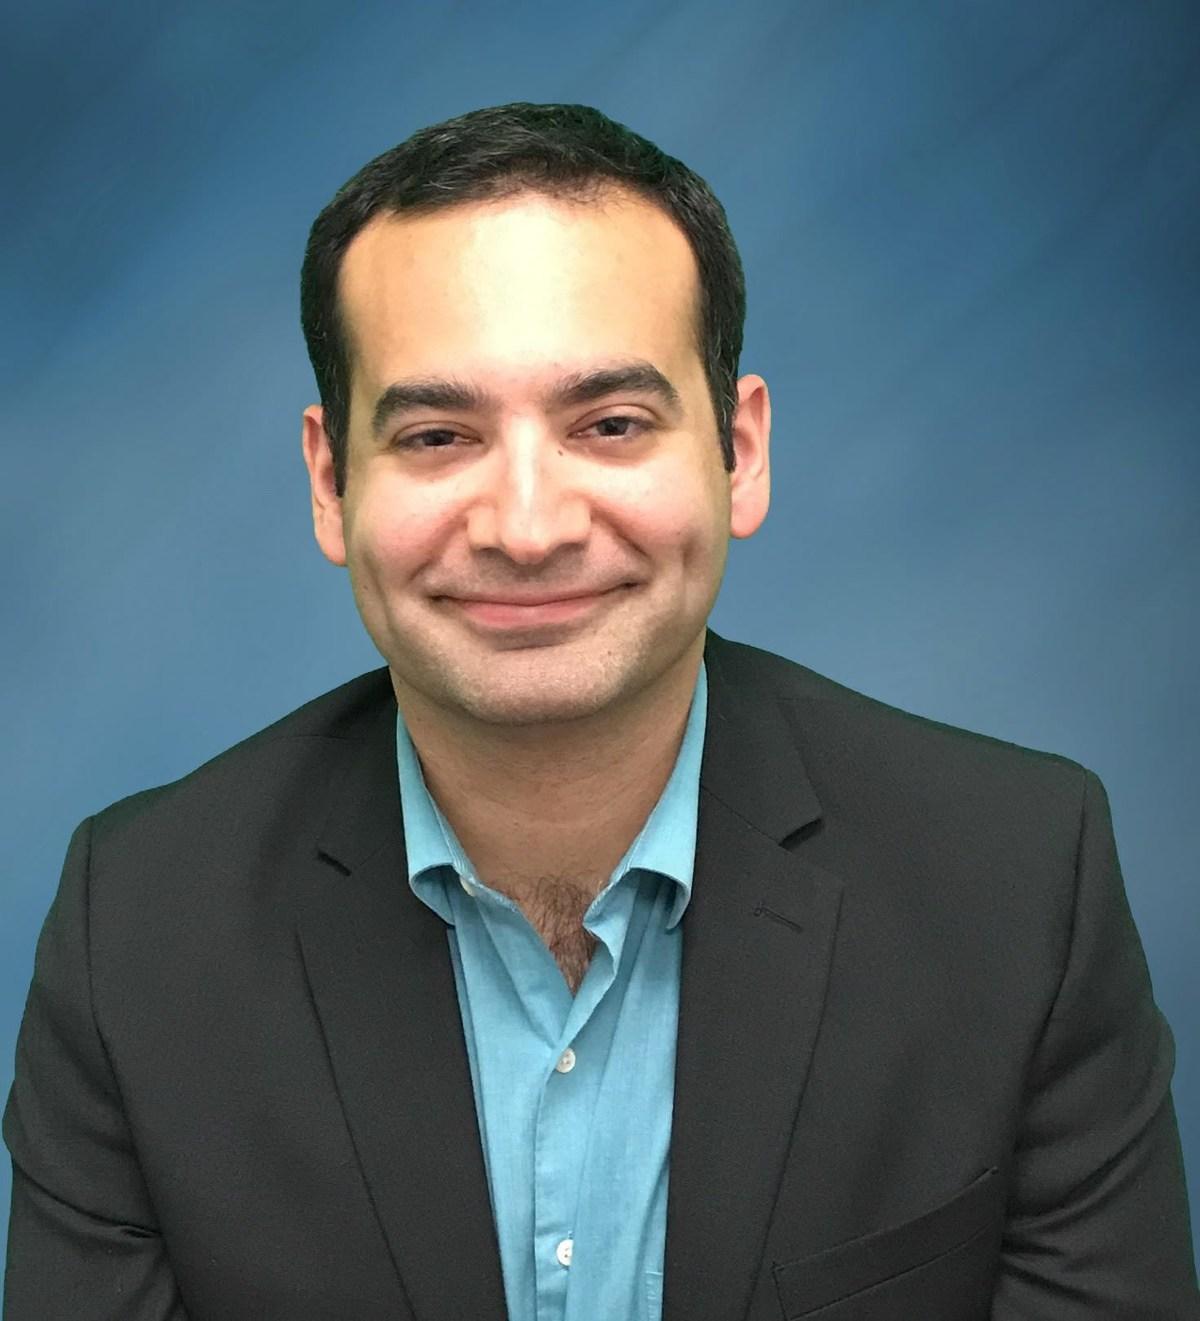 Greg Gazanian